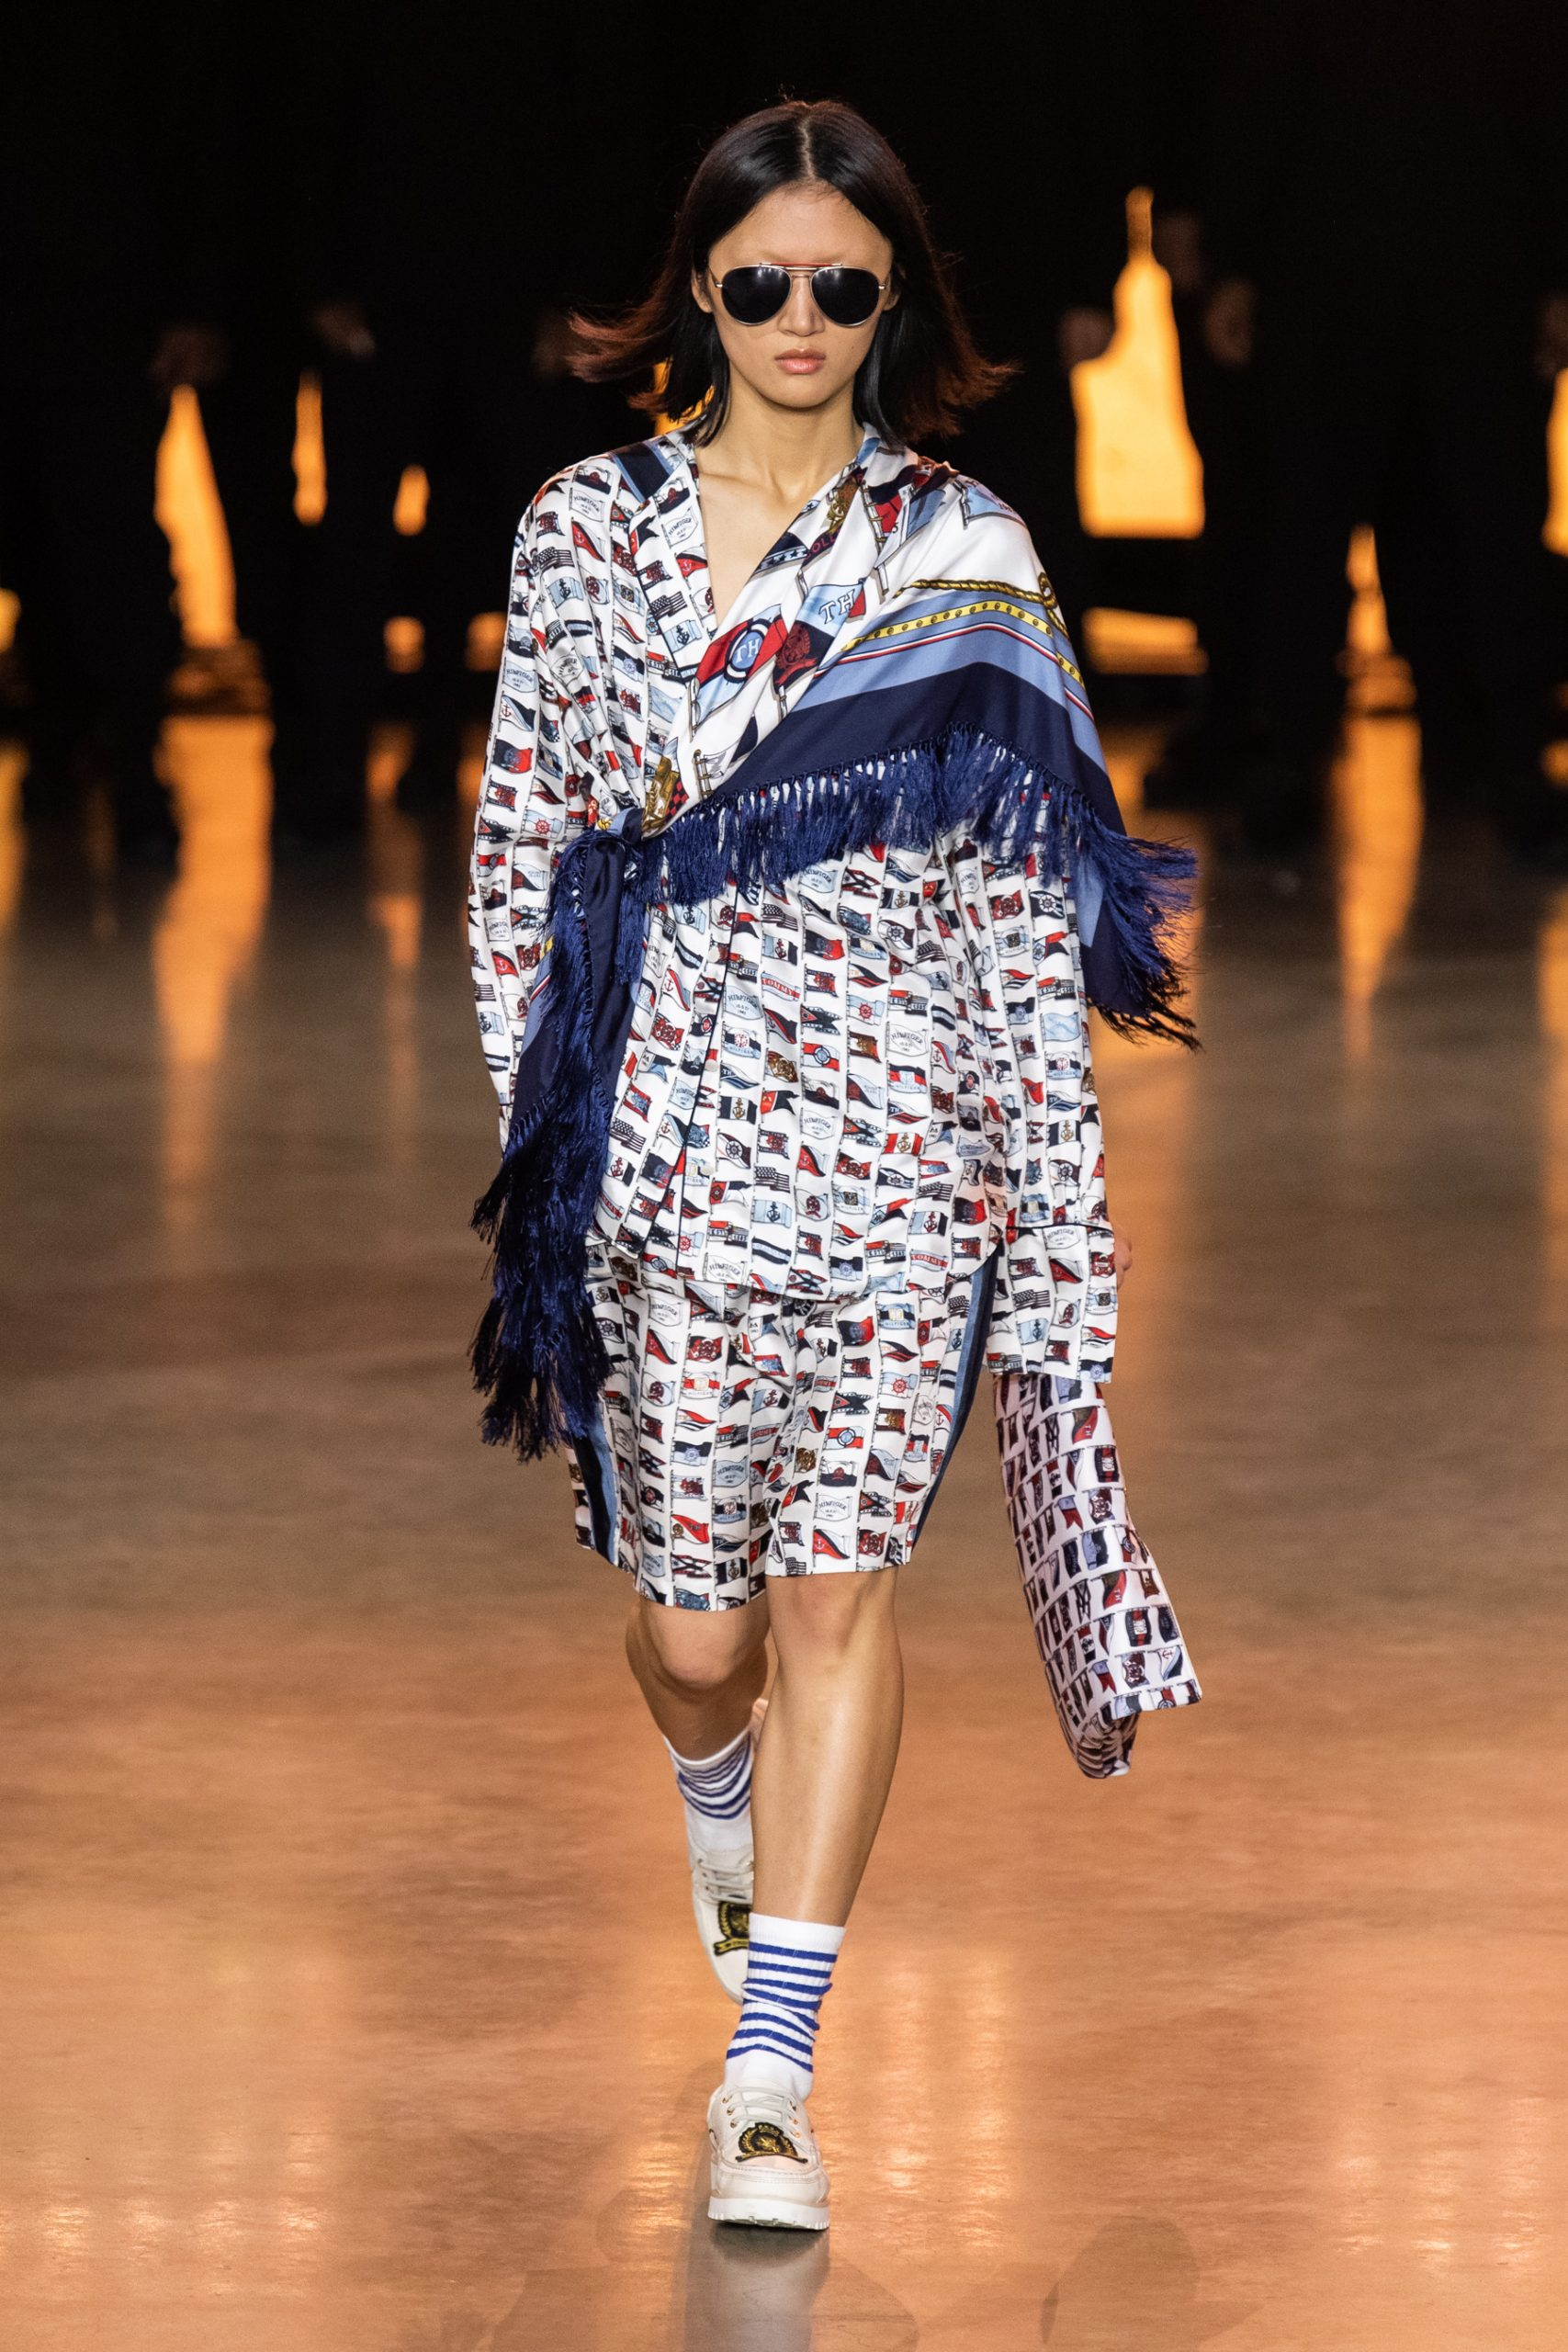 Tommy Hilfiger Lewis Hamilton Automne Hiver 2020 2021 London Fashion Week 20